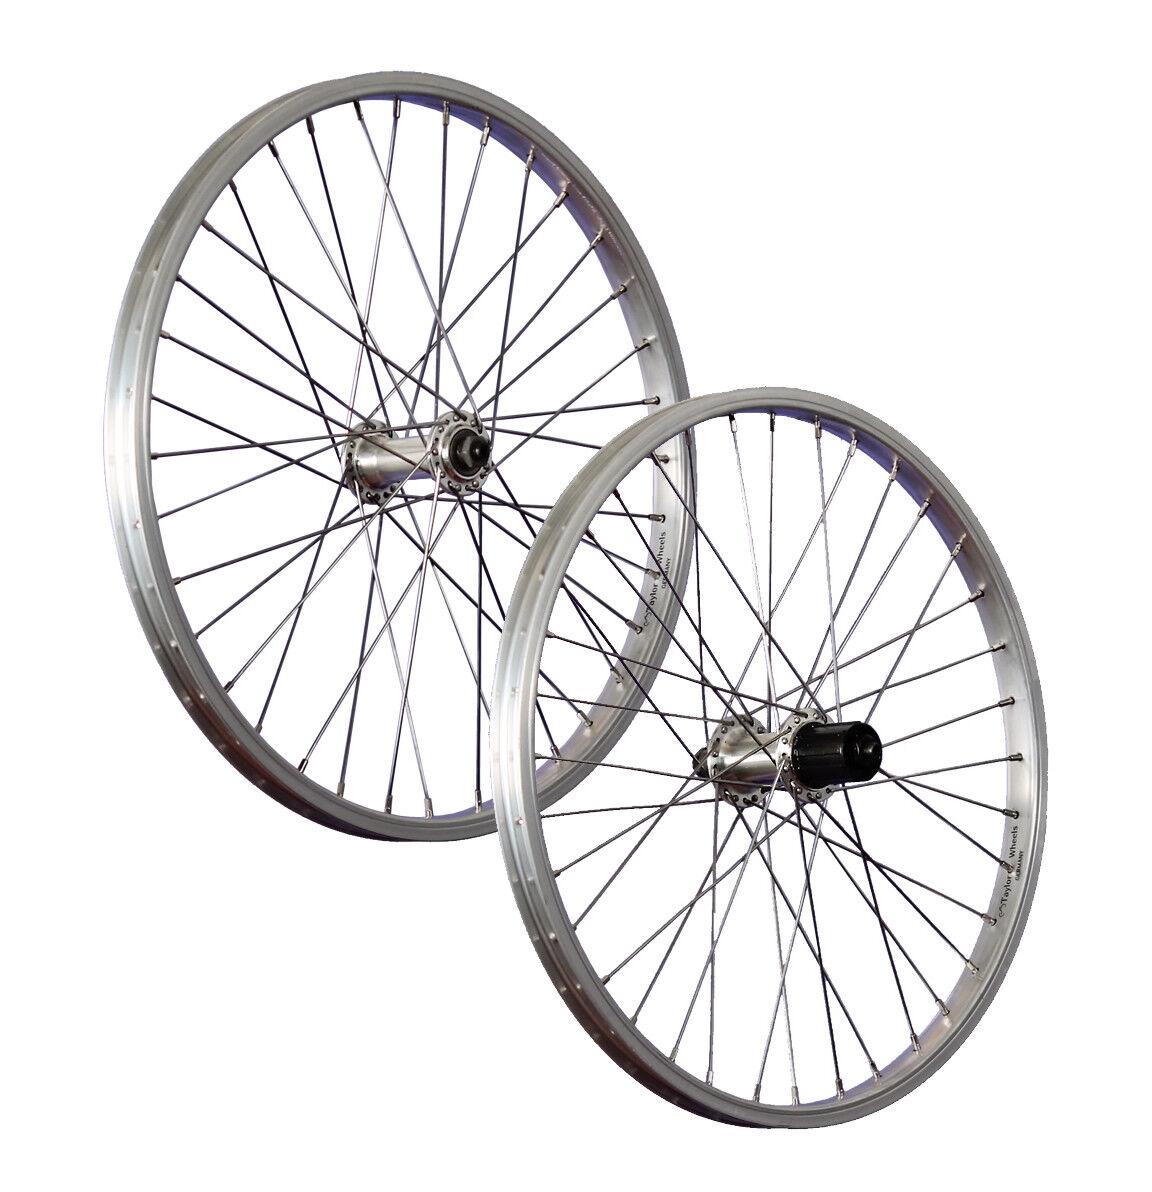 Taylor Wheels 20 Zoll Laufradsatz B 65533; (hell) 6553333; chel Aluminiumfelge Shimano TX500 7-8 fakh